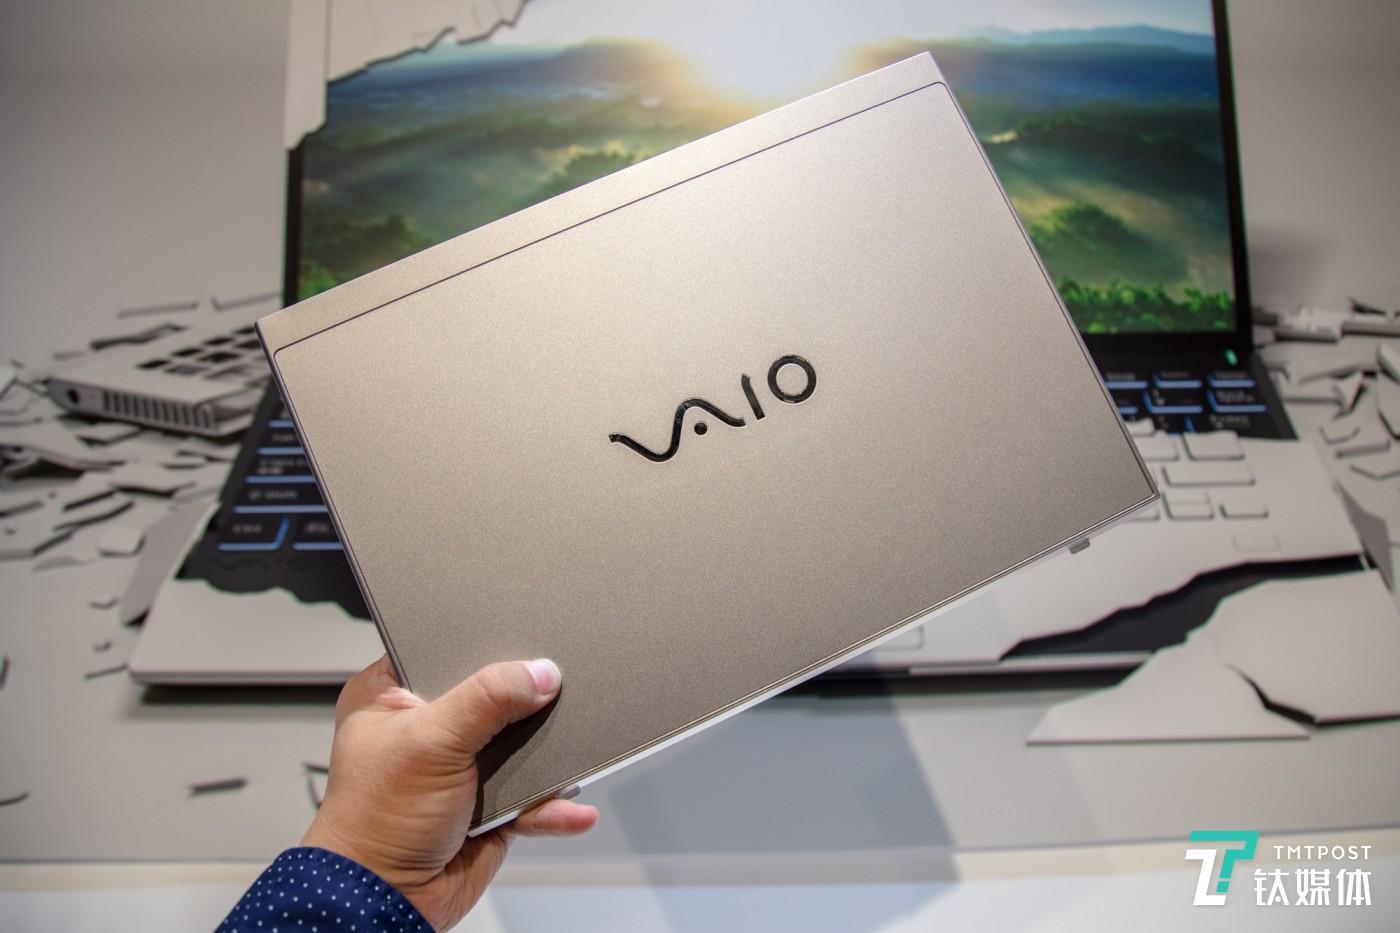 VIAO最新发布的SX12商务笔记本